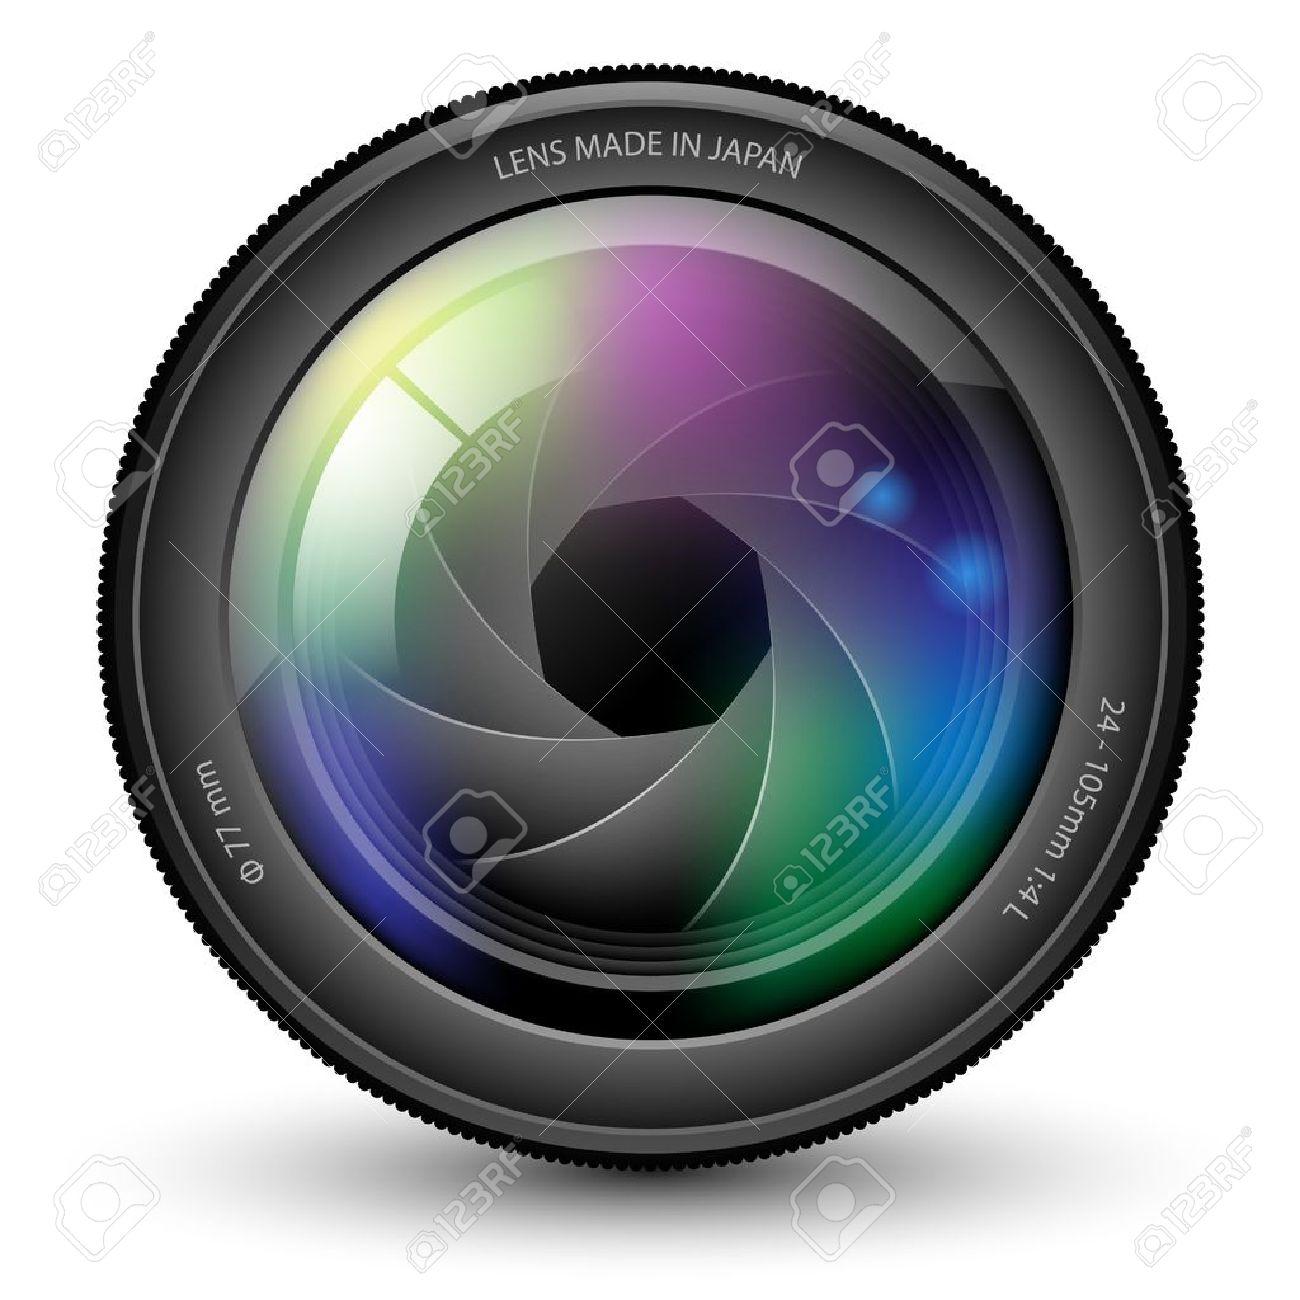 Illustration of camera lens isolated on a white background. Standard-Bild - 15476389